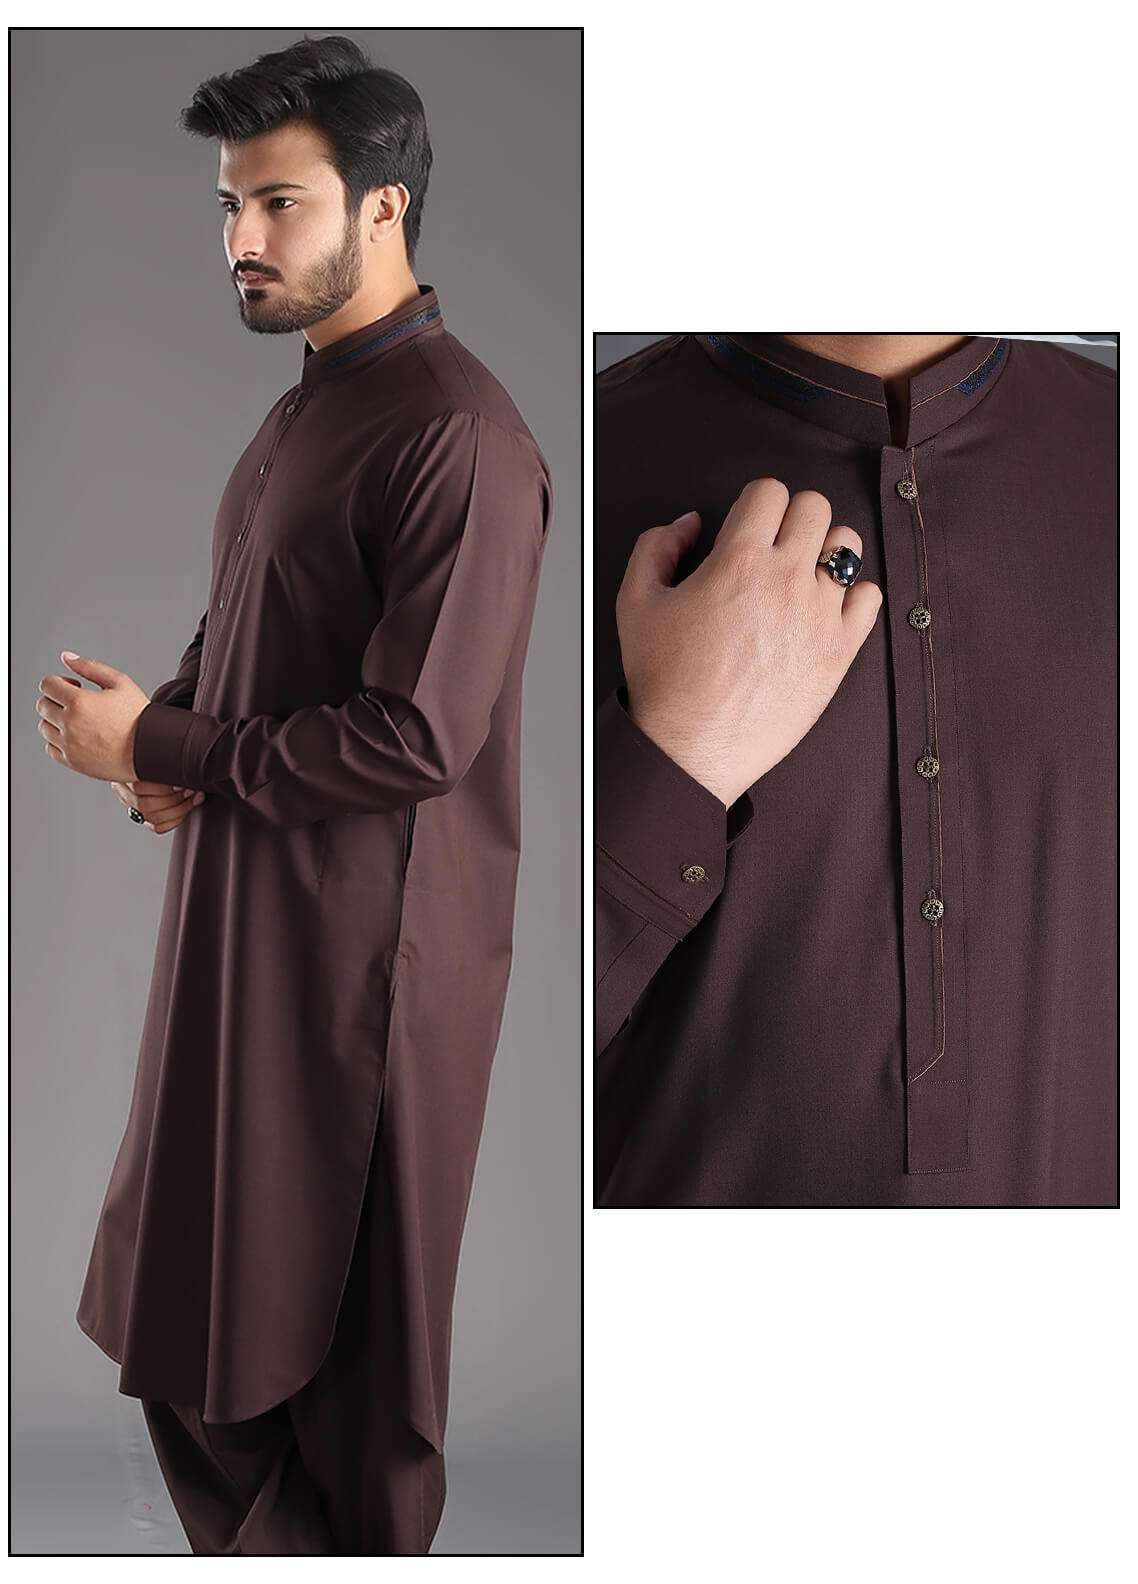 Aizaz Zafar Wash N Wear Plain Texture Shalwar Kameez for Men - Maroon AZ18M 024